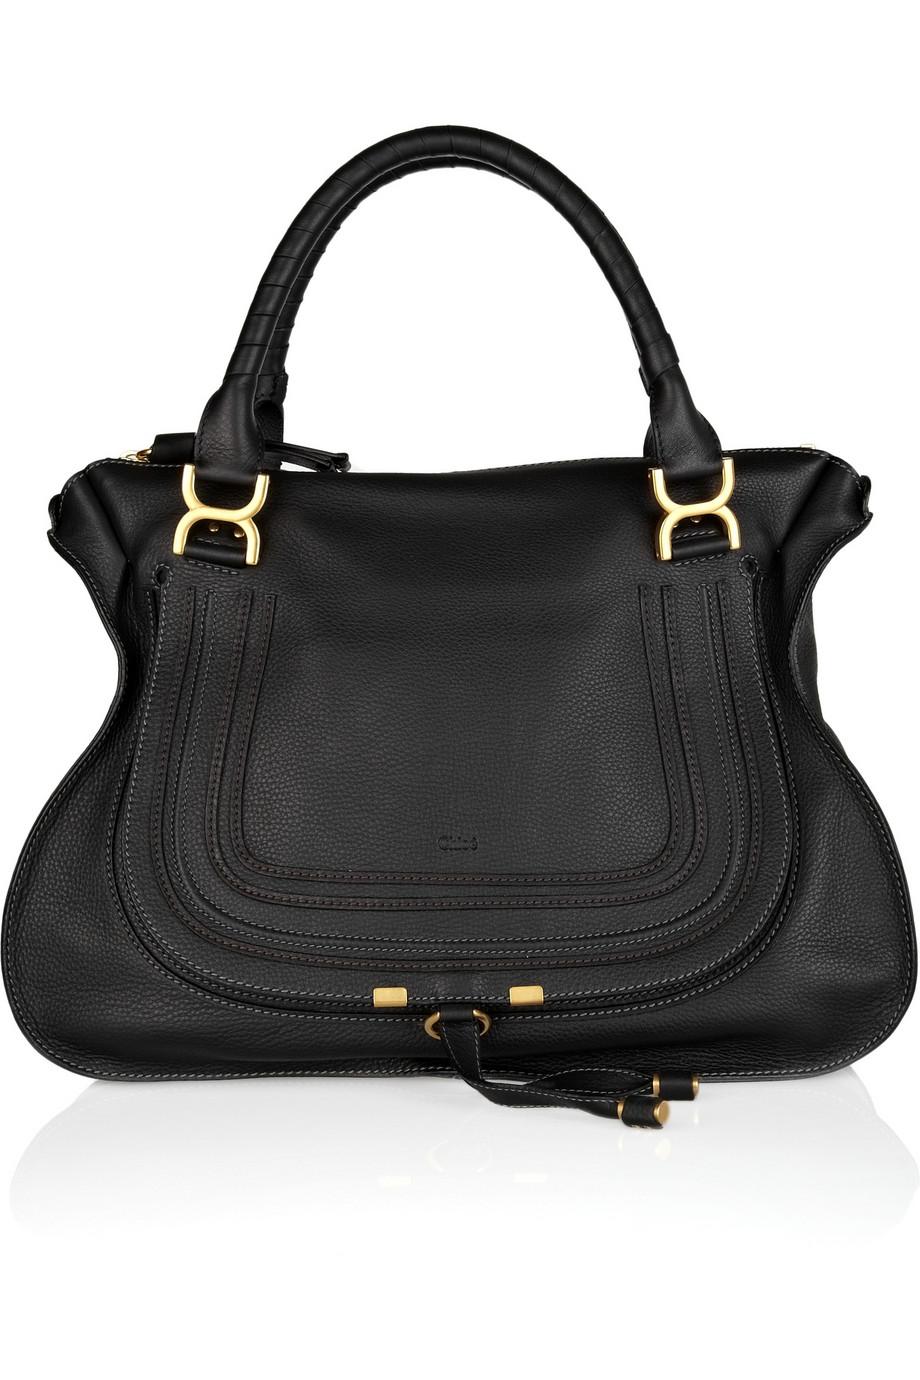 see by chloe purses - black chloe handbag